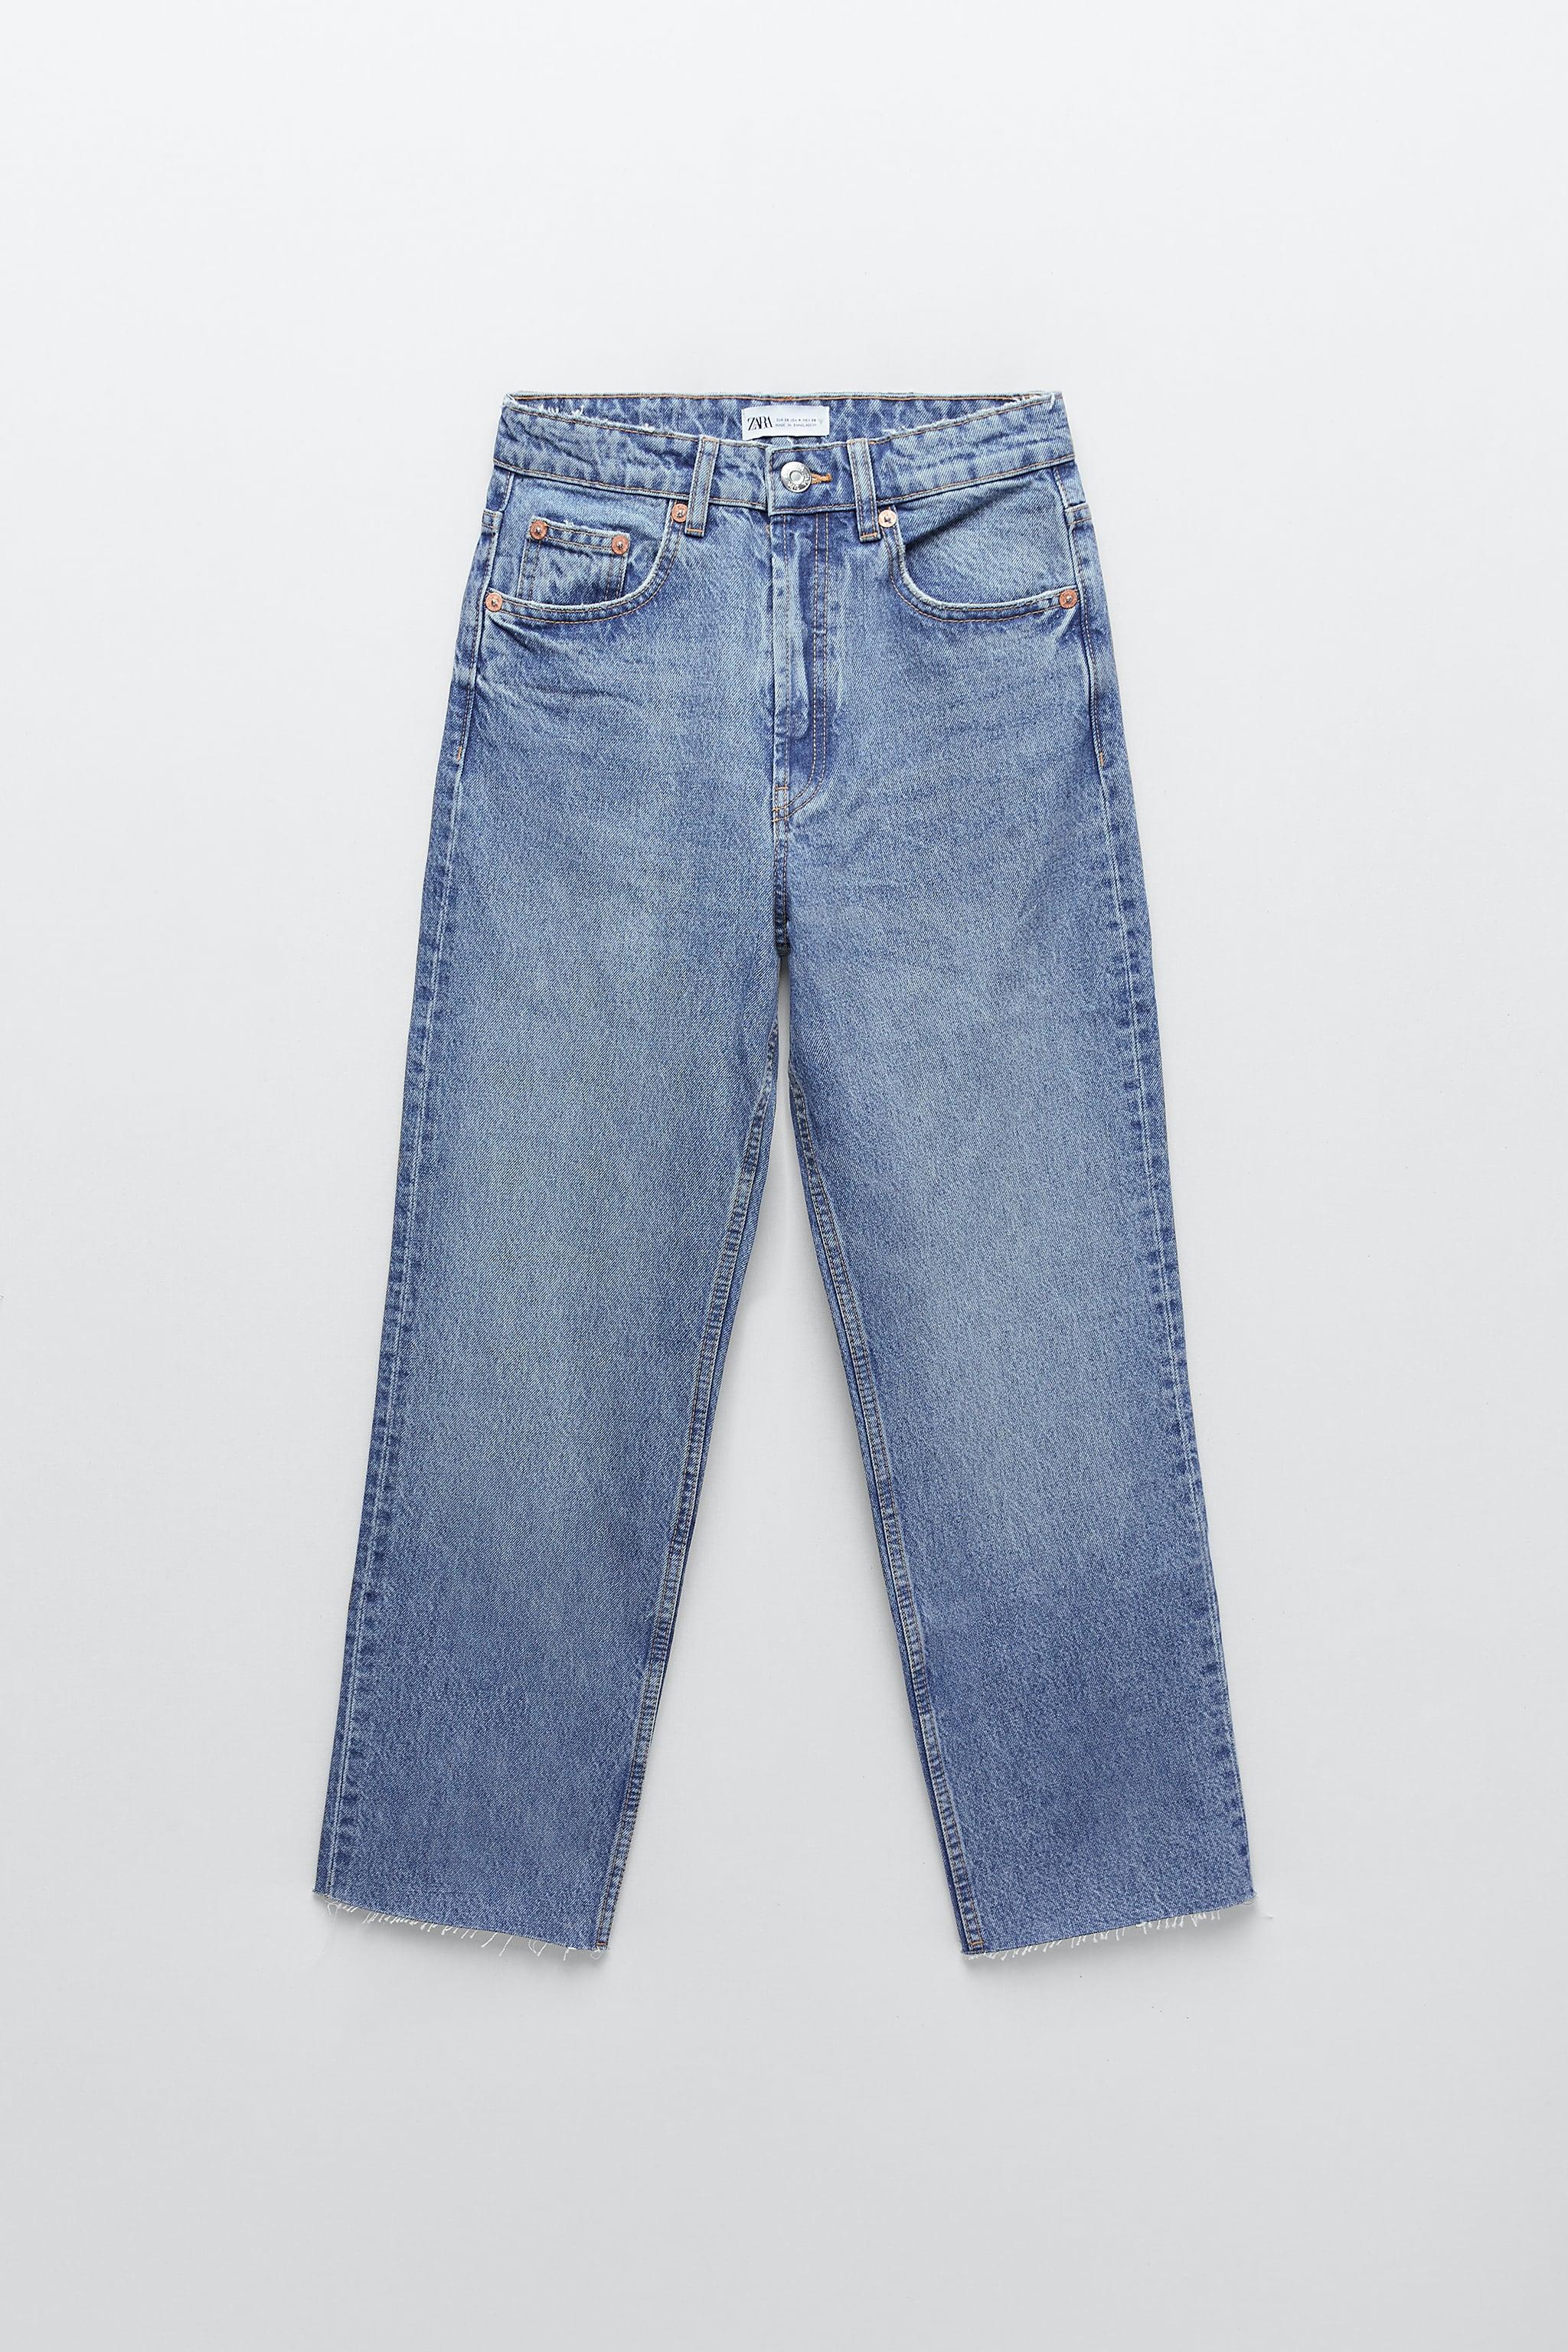 Zara pantalones cintura alta